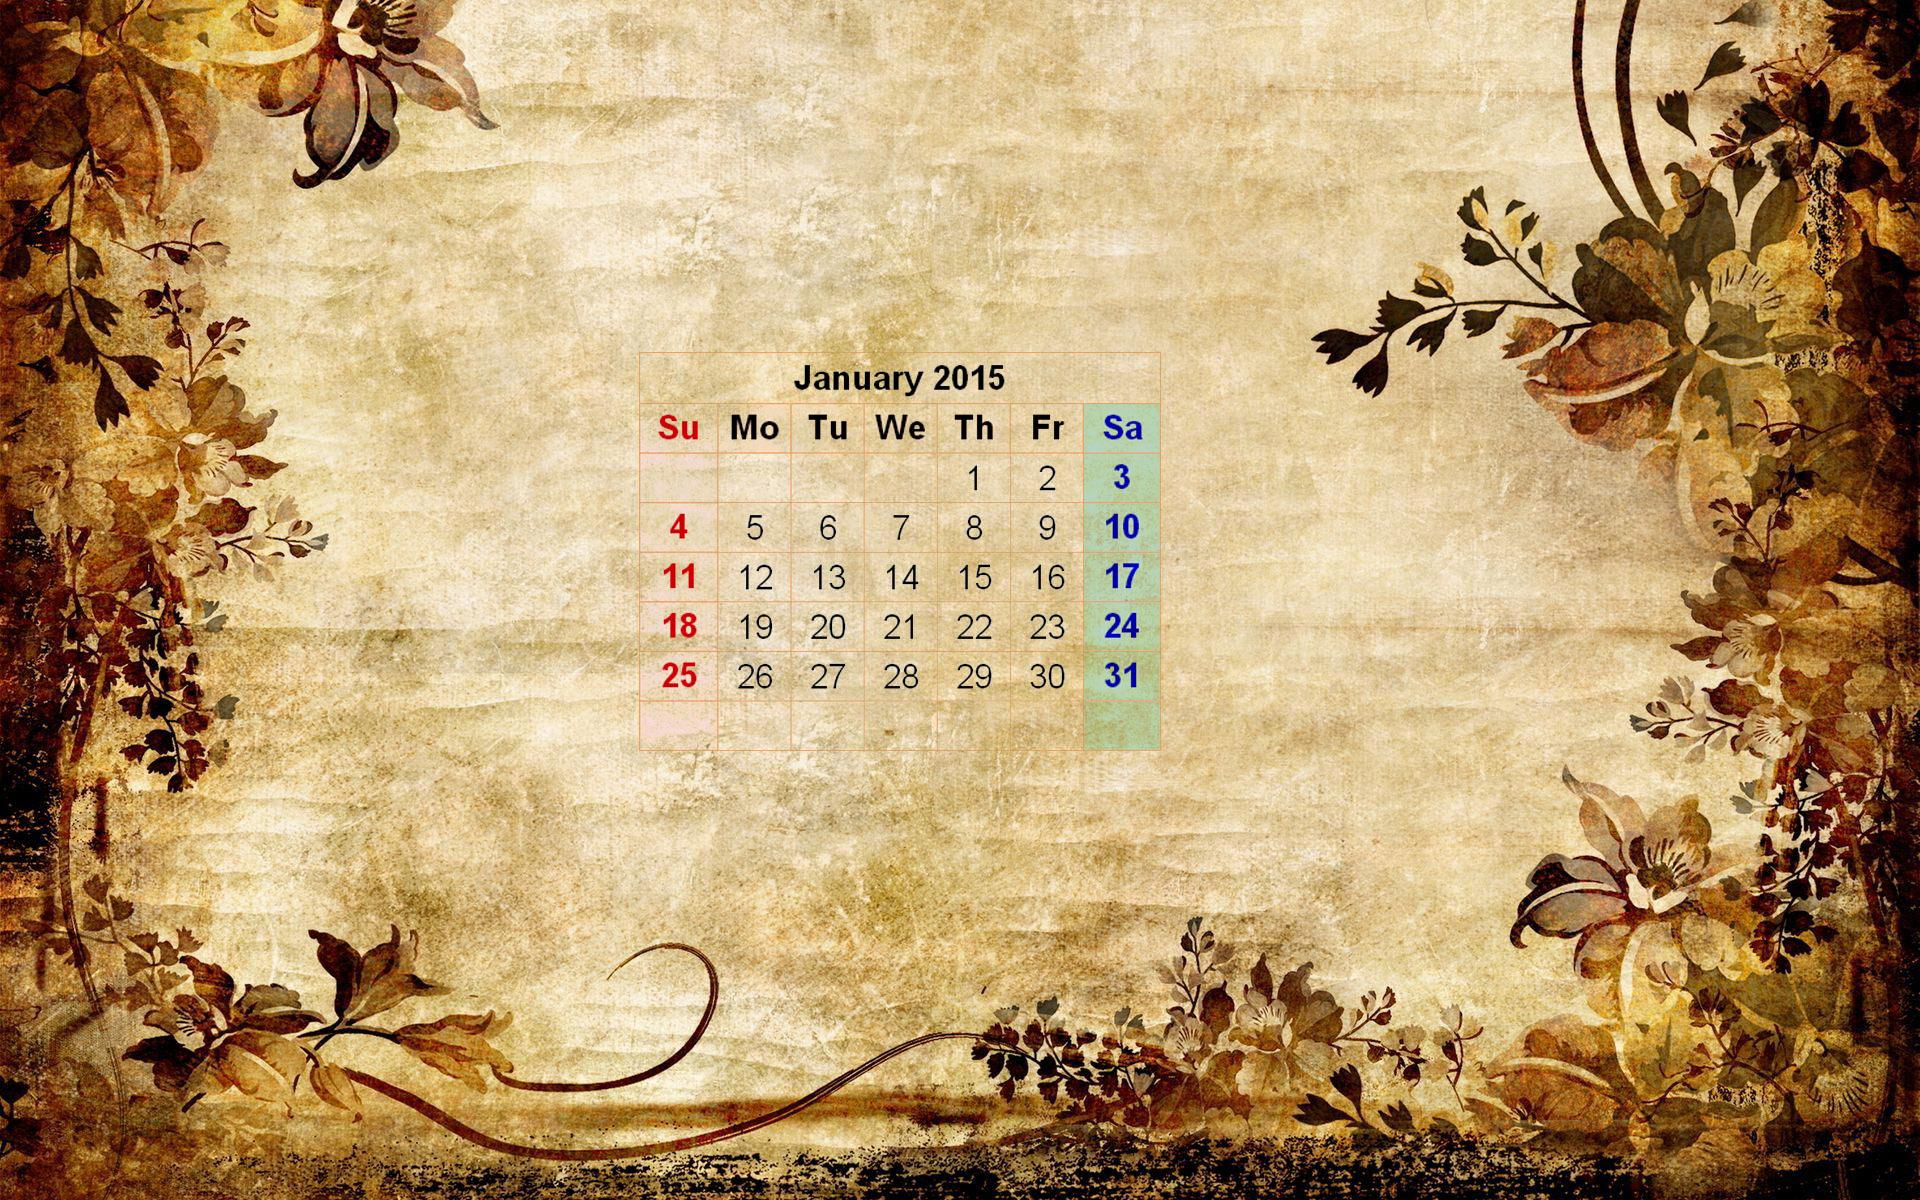 January 2016 Wallpaper Calendar - WallpaperSafari